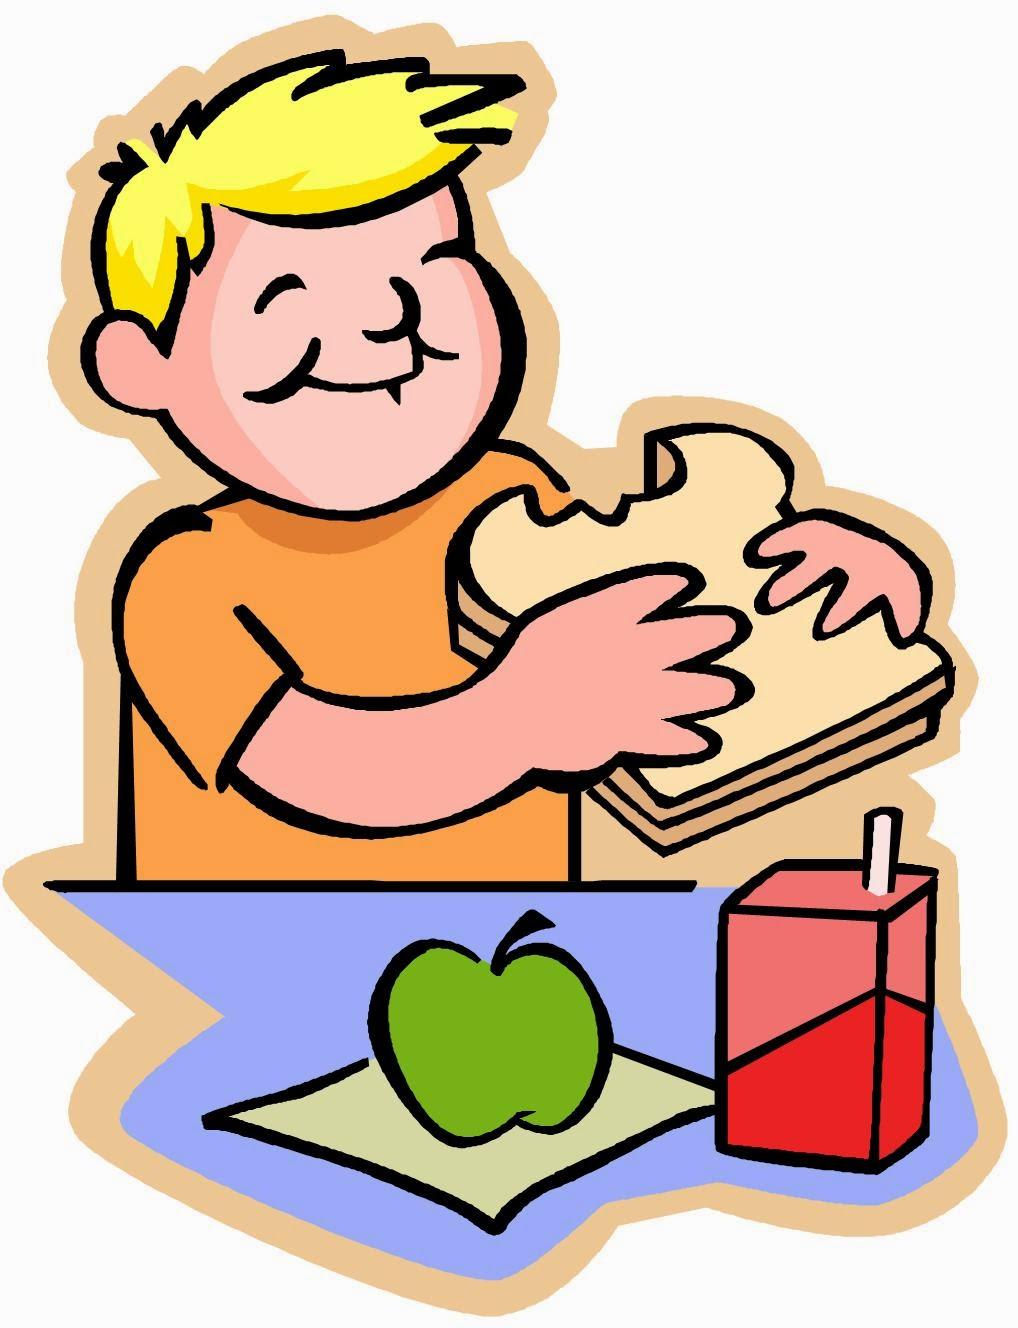 Gambar Animasi Makan : gambar, animasi, makan, Gambar, Animasi, Orang, Makan